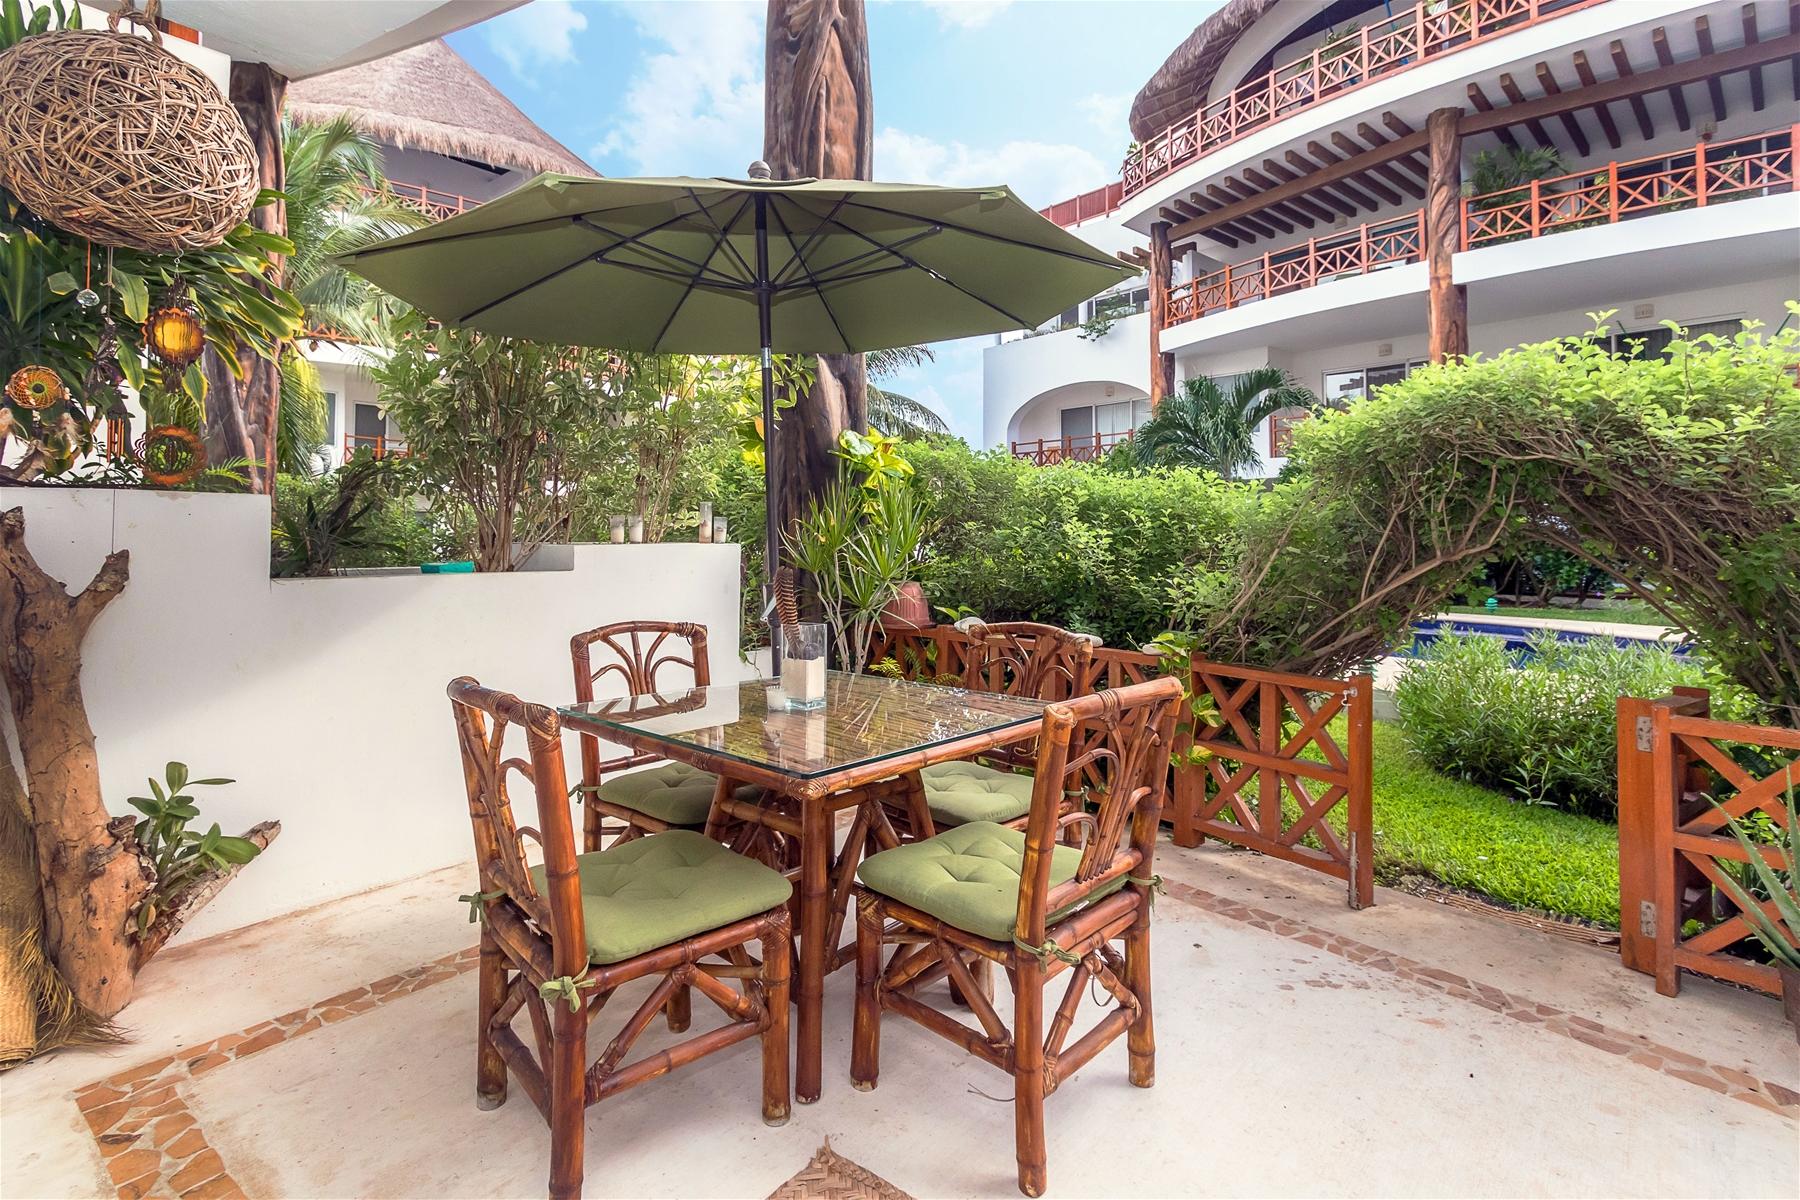 Quadra Alea Xaman 102 Playa del Carmen Condo Home For Sale Real Estate to Buy